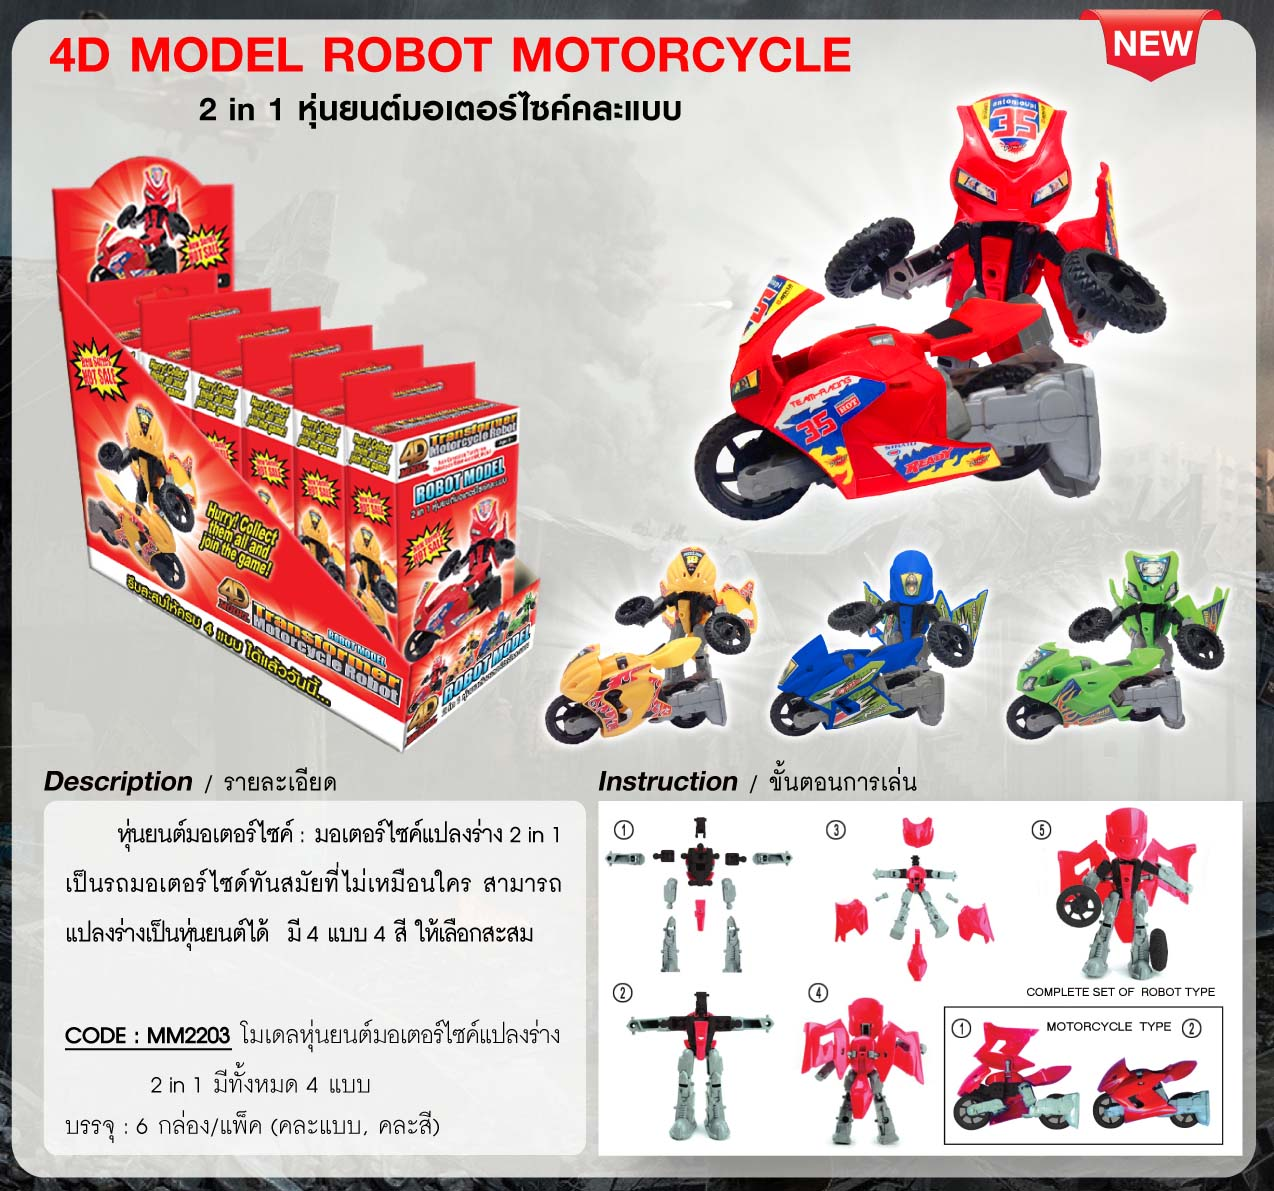 4D Model Robot Motorcycle: 2in1หุ่นยนต์มอเตอร์ไซค์